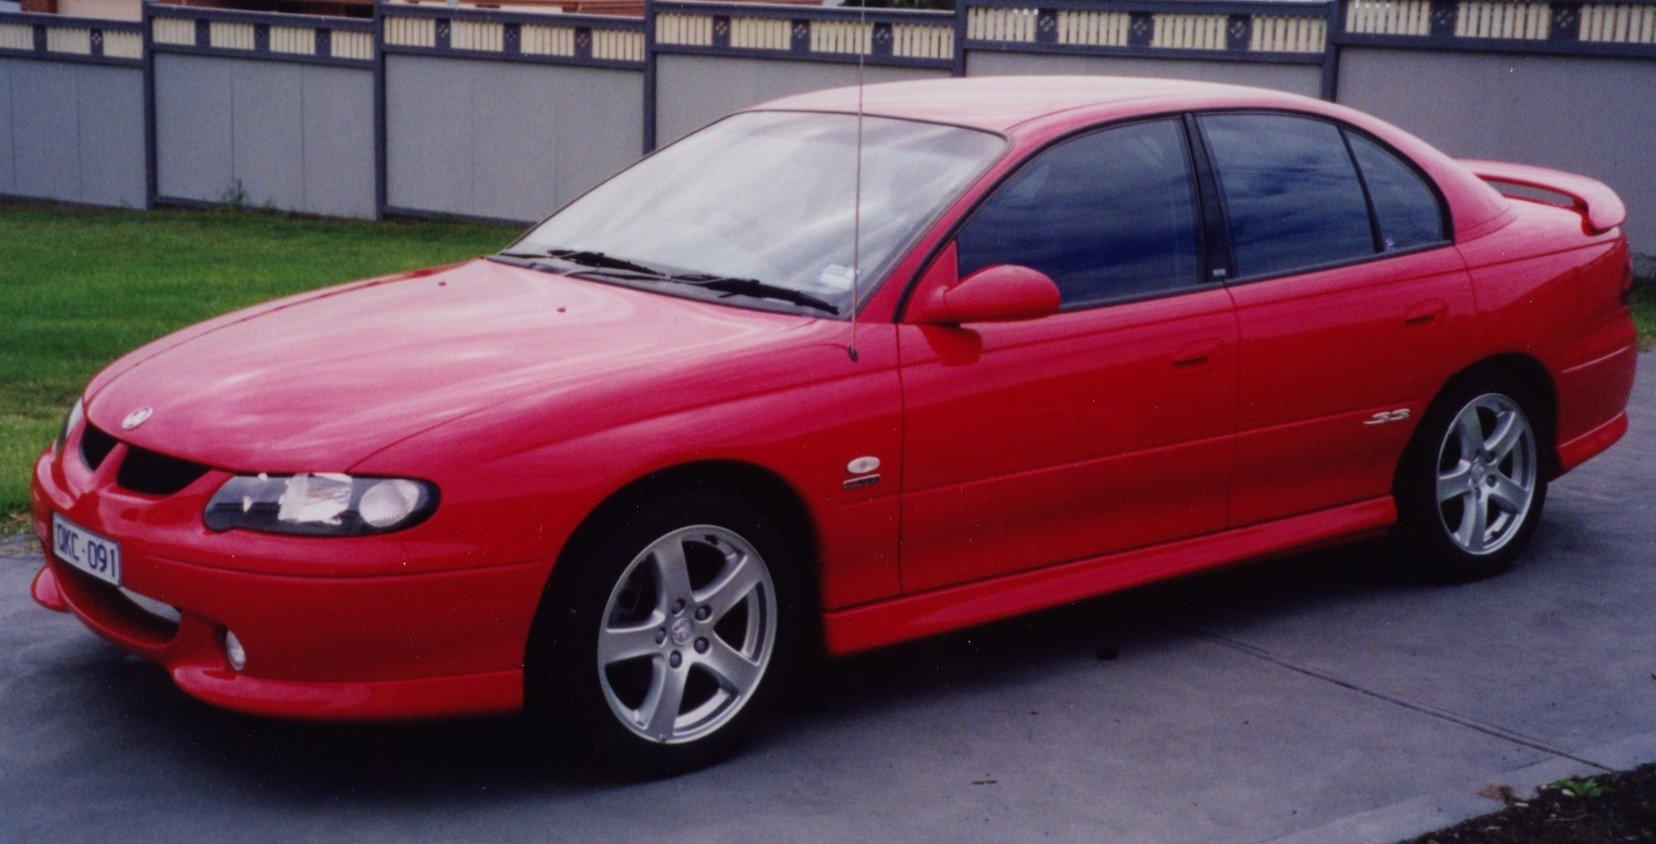 "17x8"" wheels with Bridgestone 235/45R17 Limited slip diff, ABS Brakes ..."